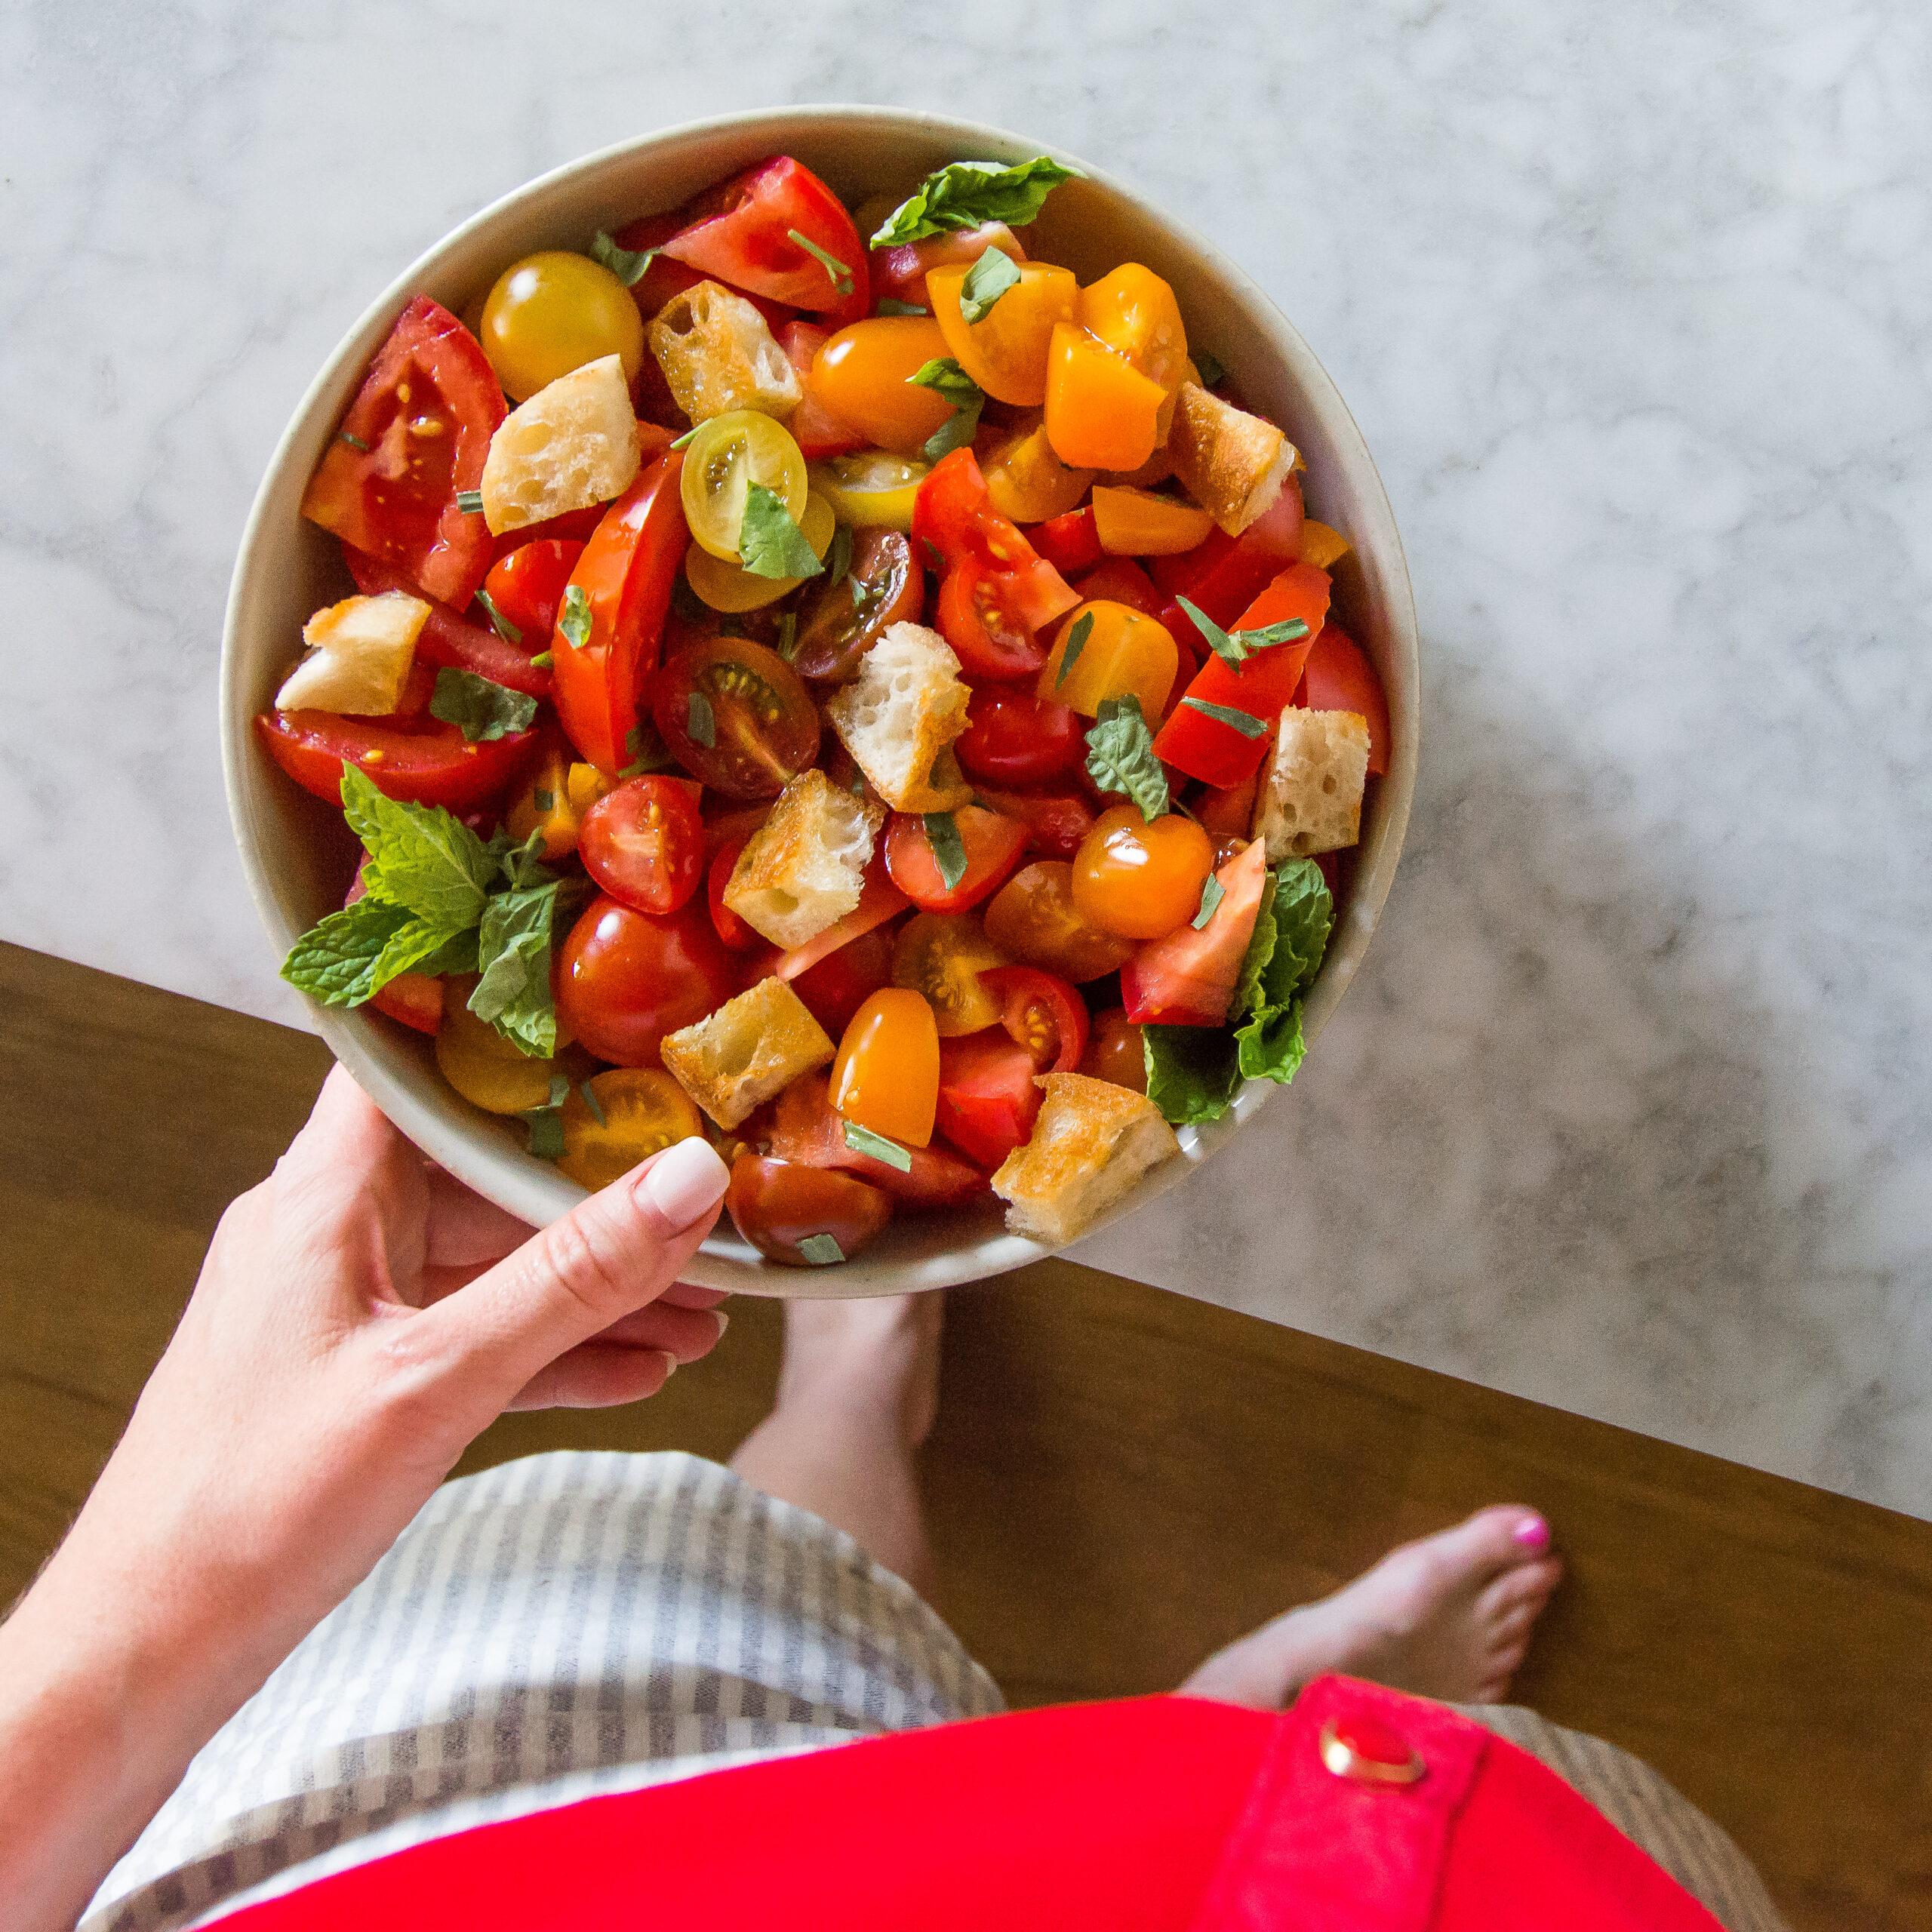 Tomato Story Cutting Tomato Herb Salad (1 of 1)